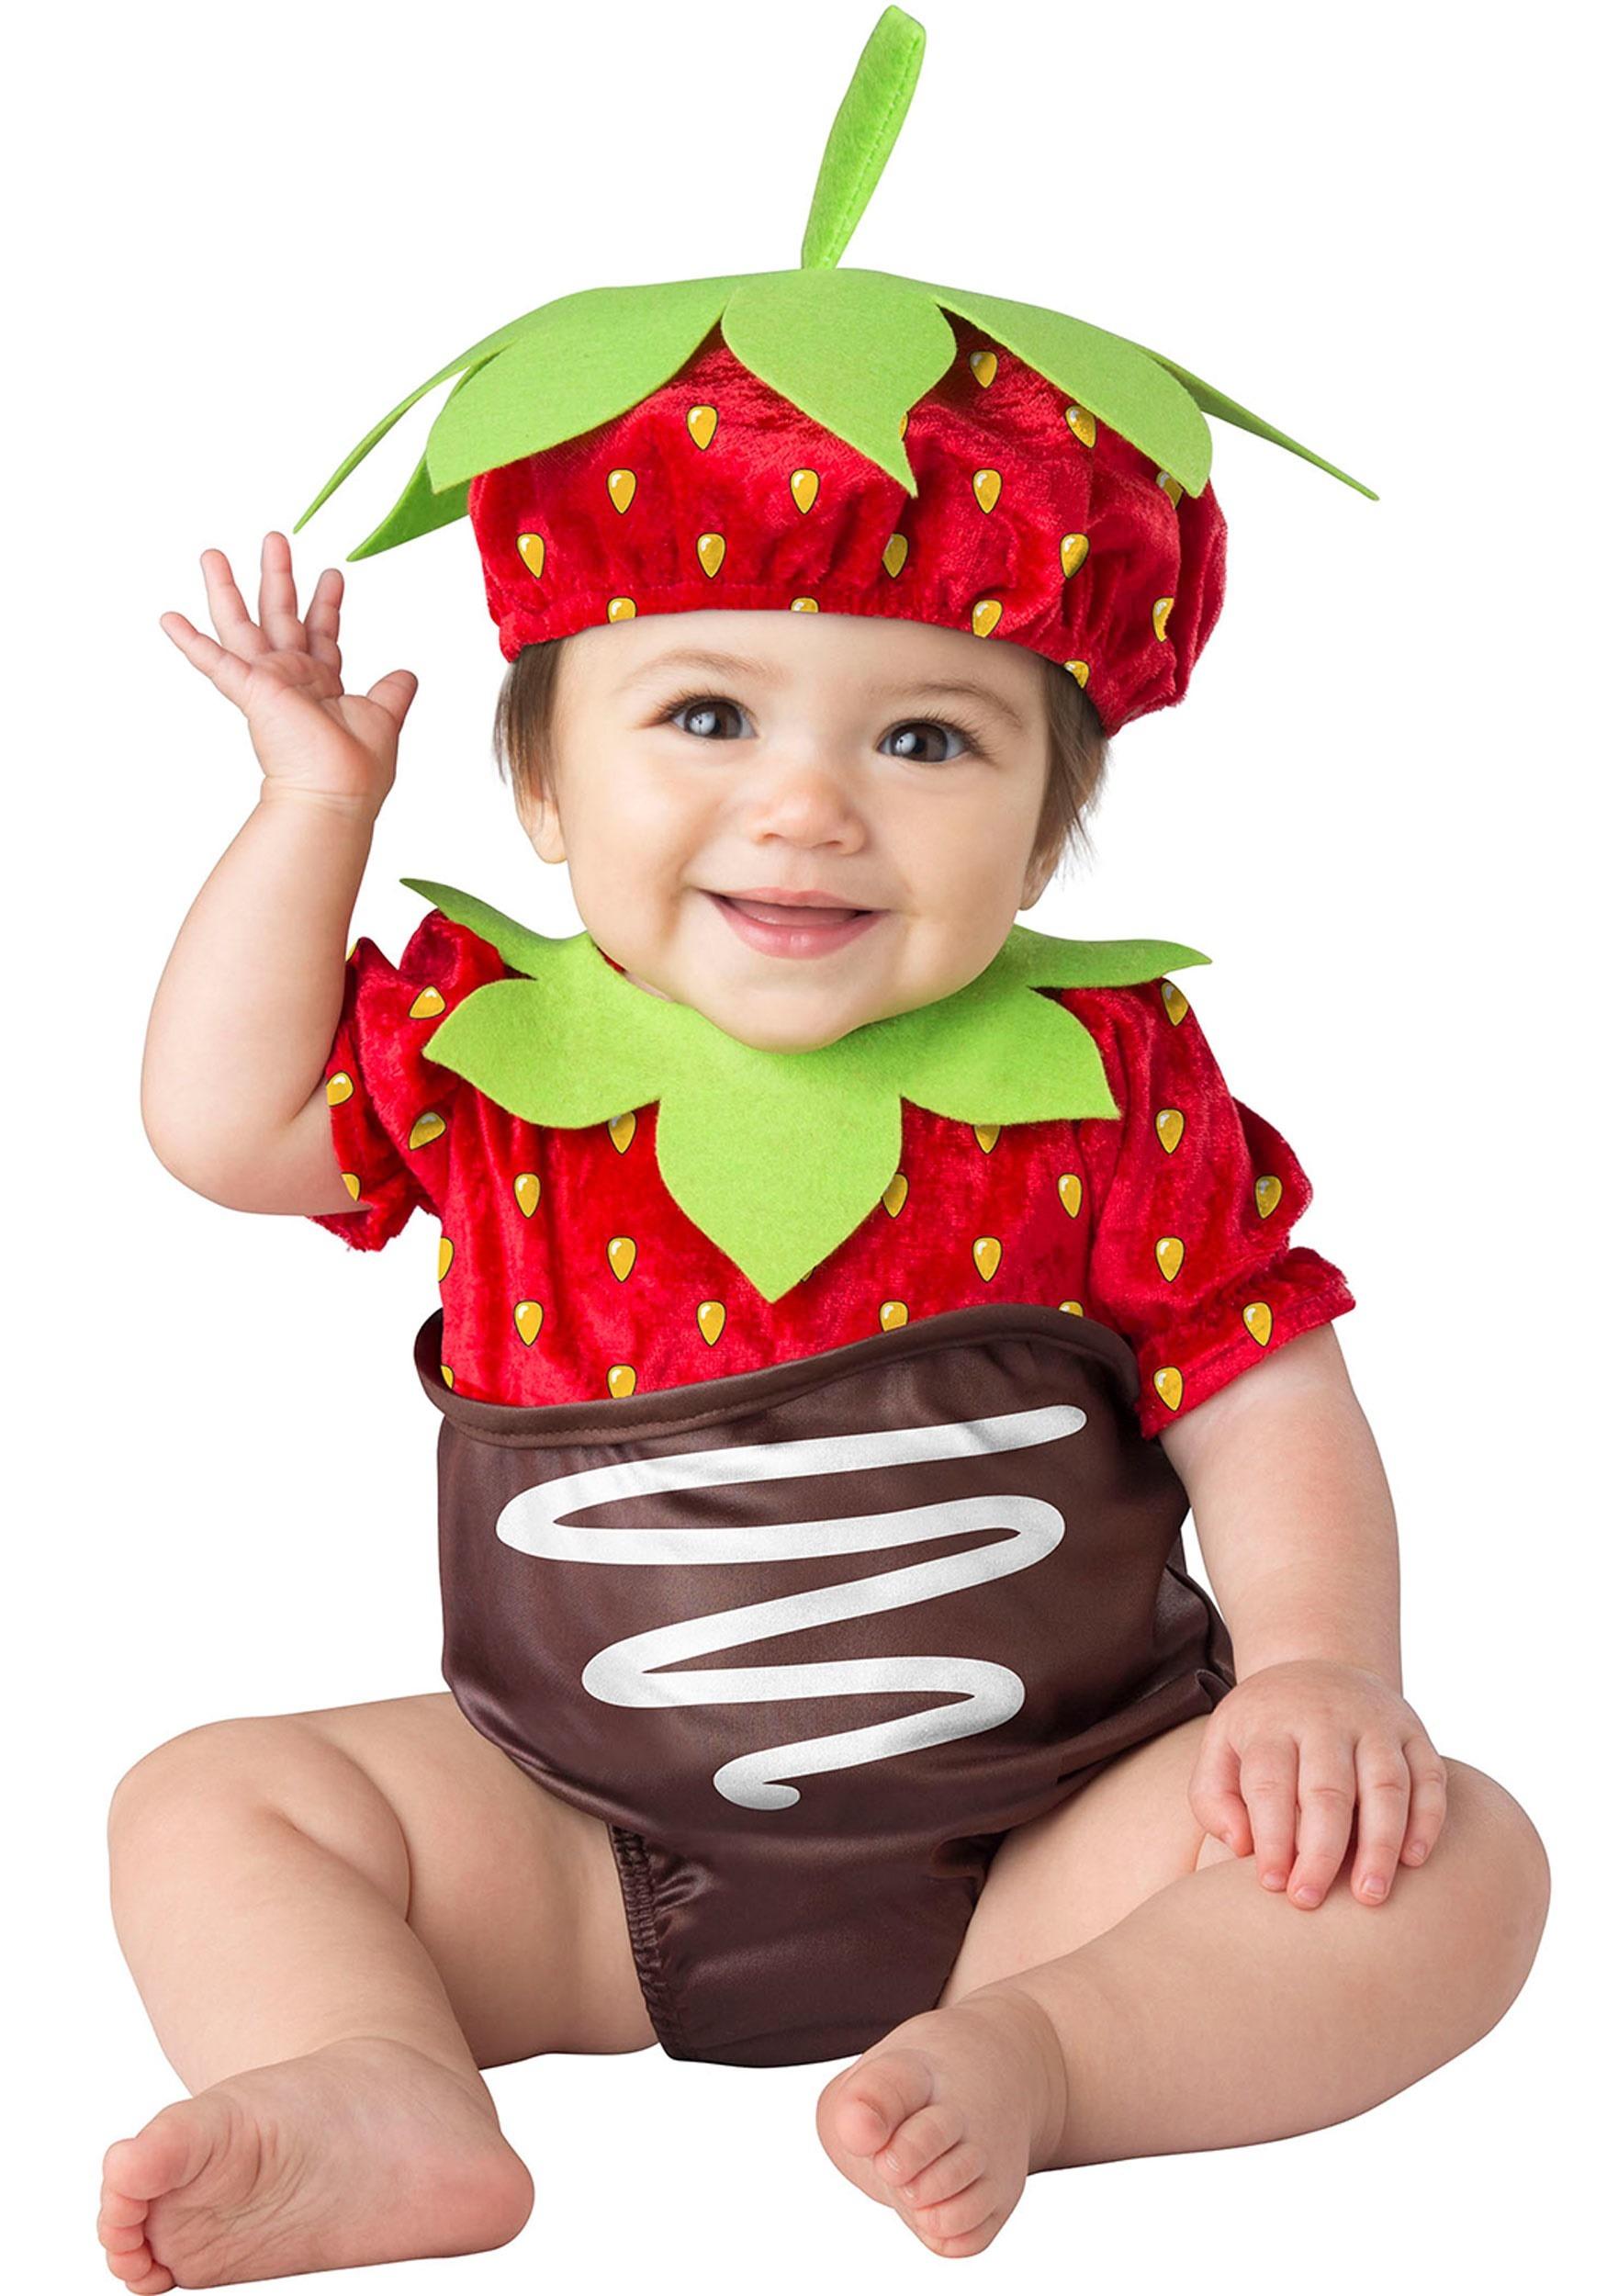 d3f207e8b Chocolate Strawberry Costume for a Child